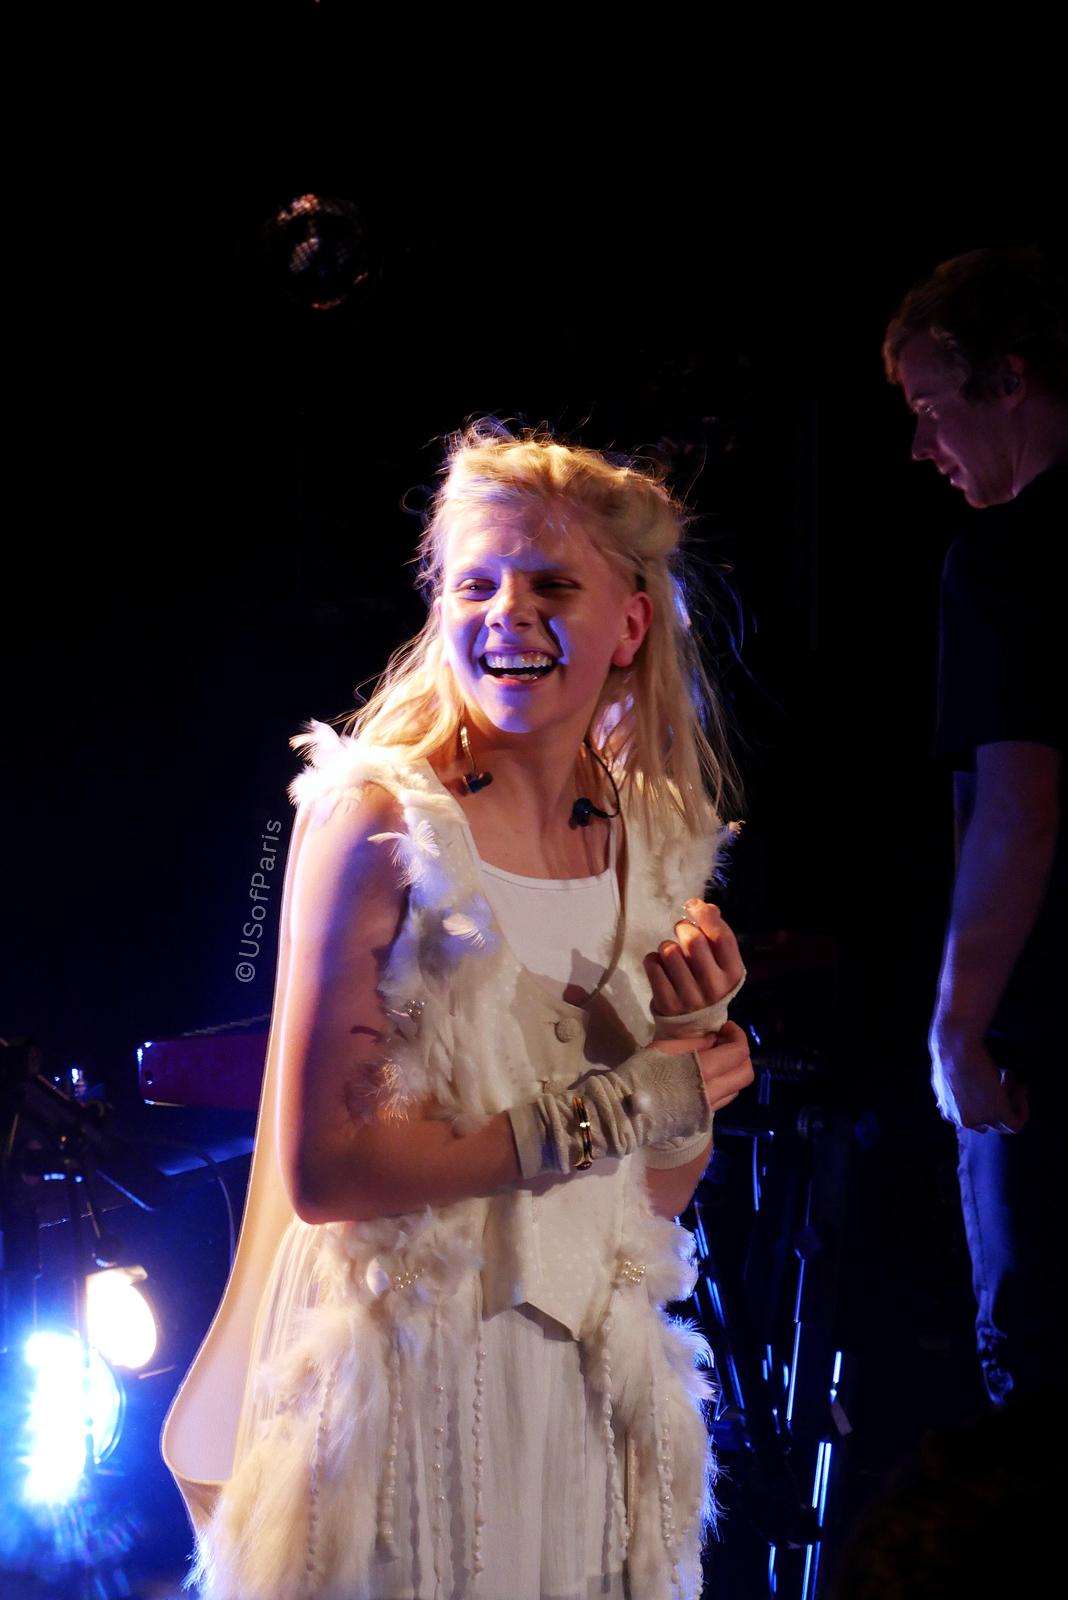 aurora-music-smile-live-concert-paris-la-maroquinerie-france-stage-photo-usofparis-blog